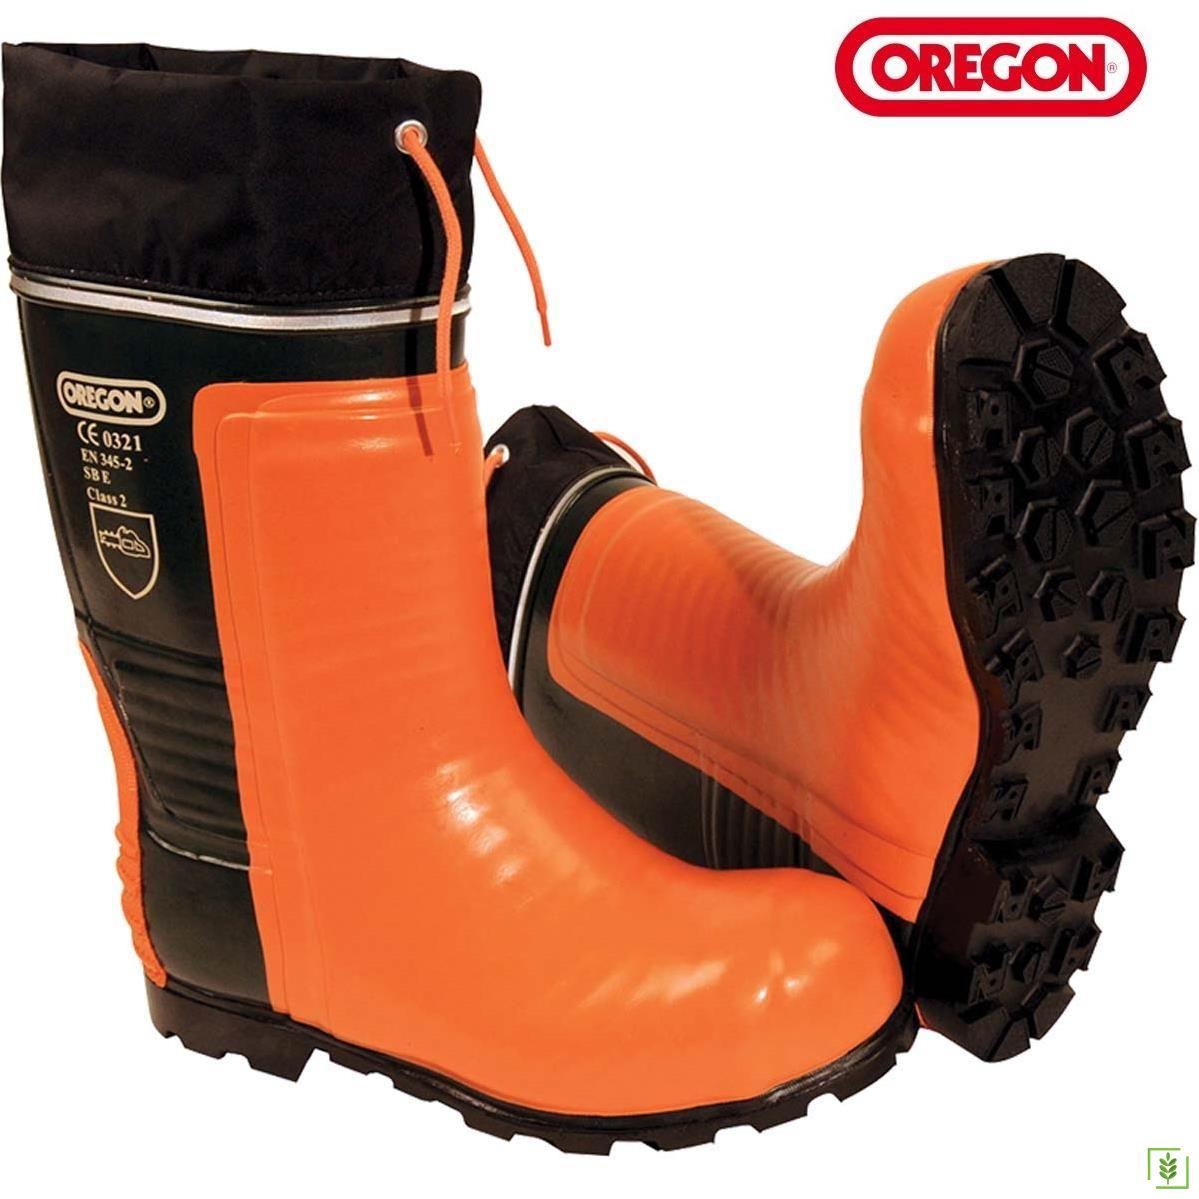 Oregon 295385/44 Zincir Kesmez Çizme 44 Numara